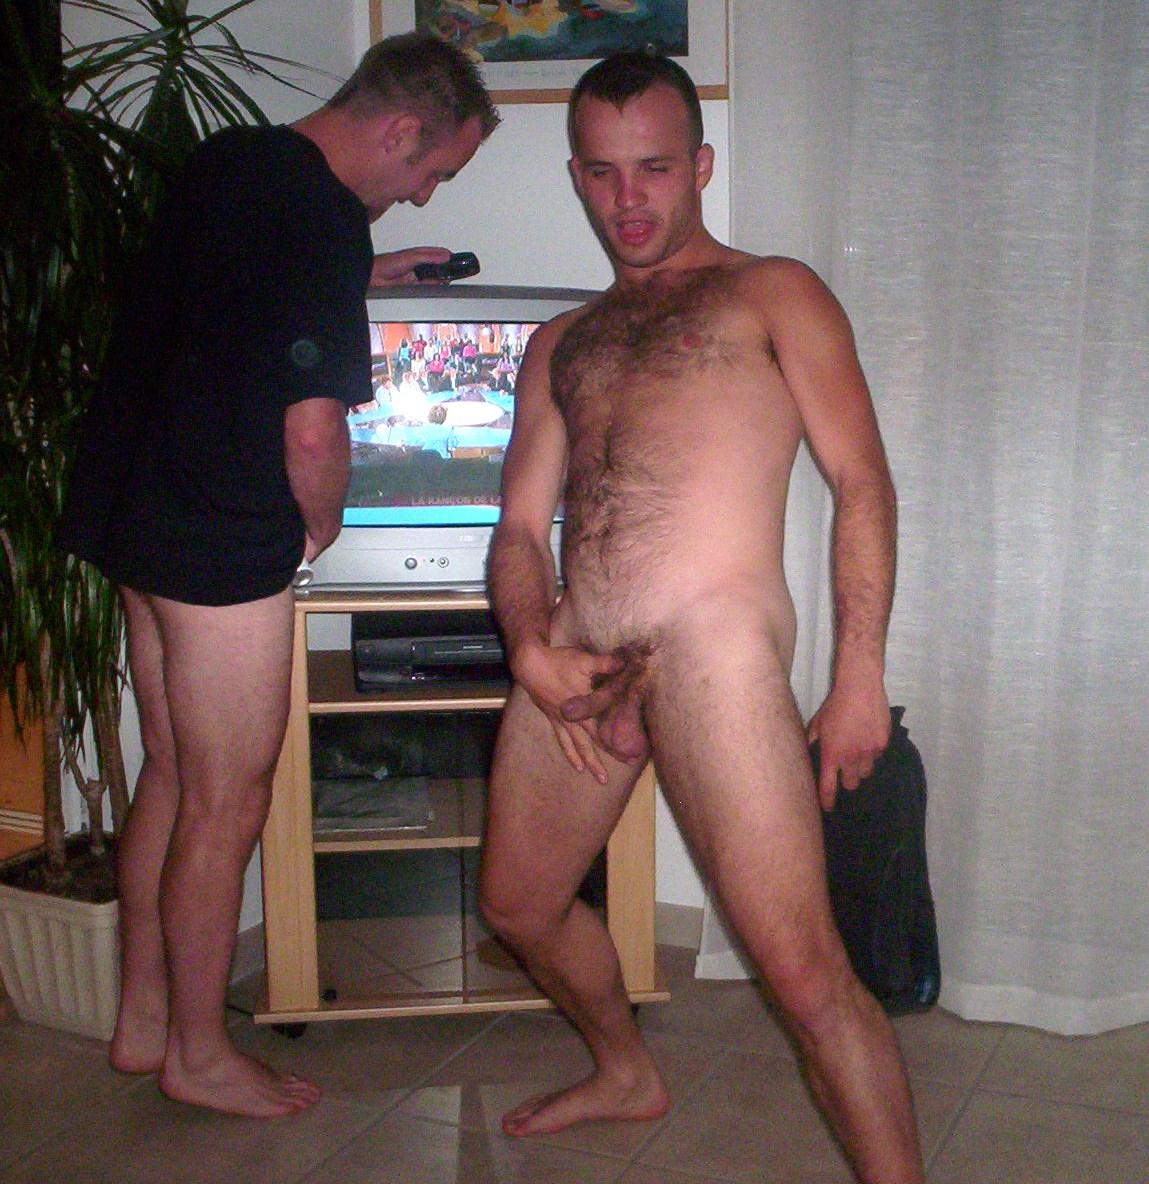 Voyeur photo men locker room hard dick free xxx galeries